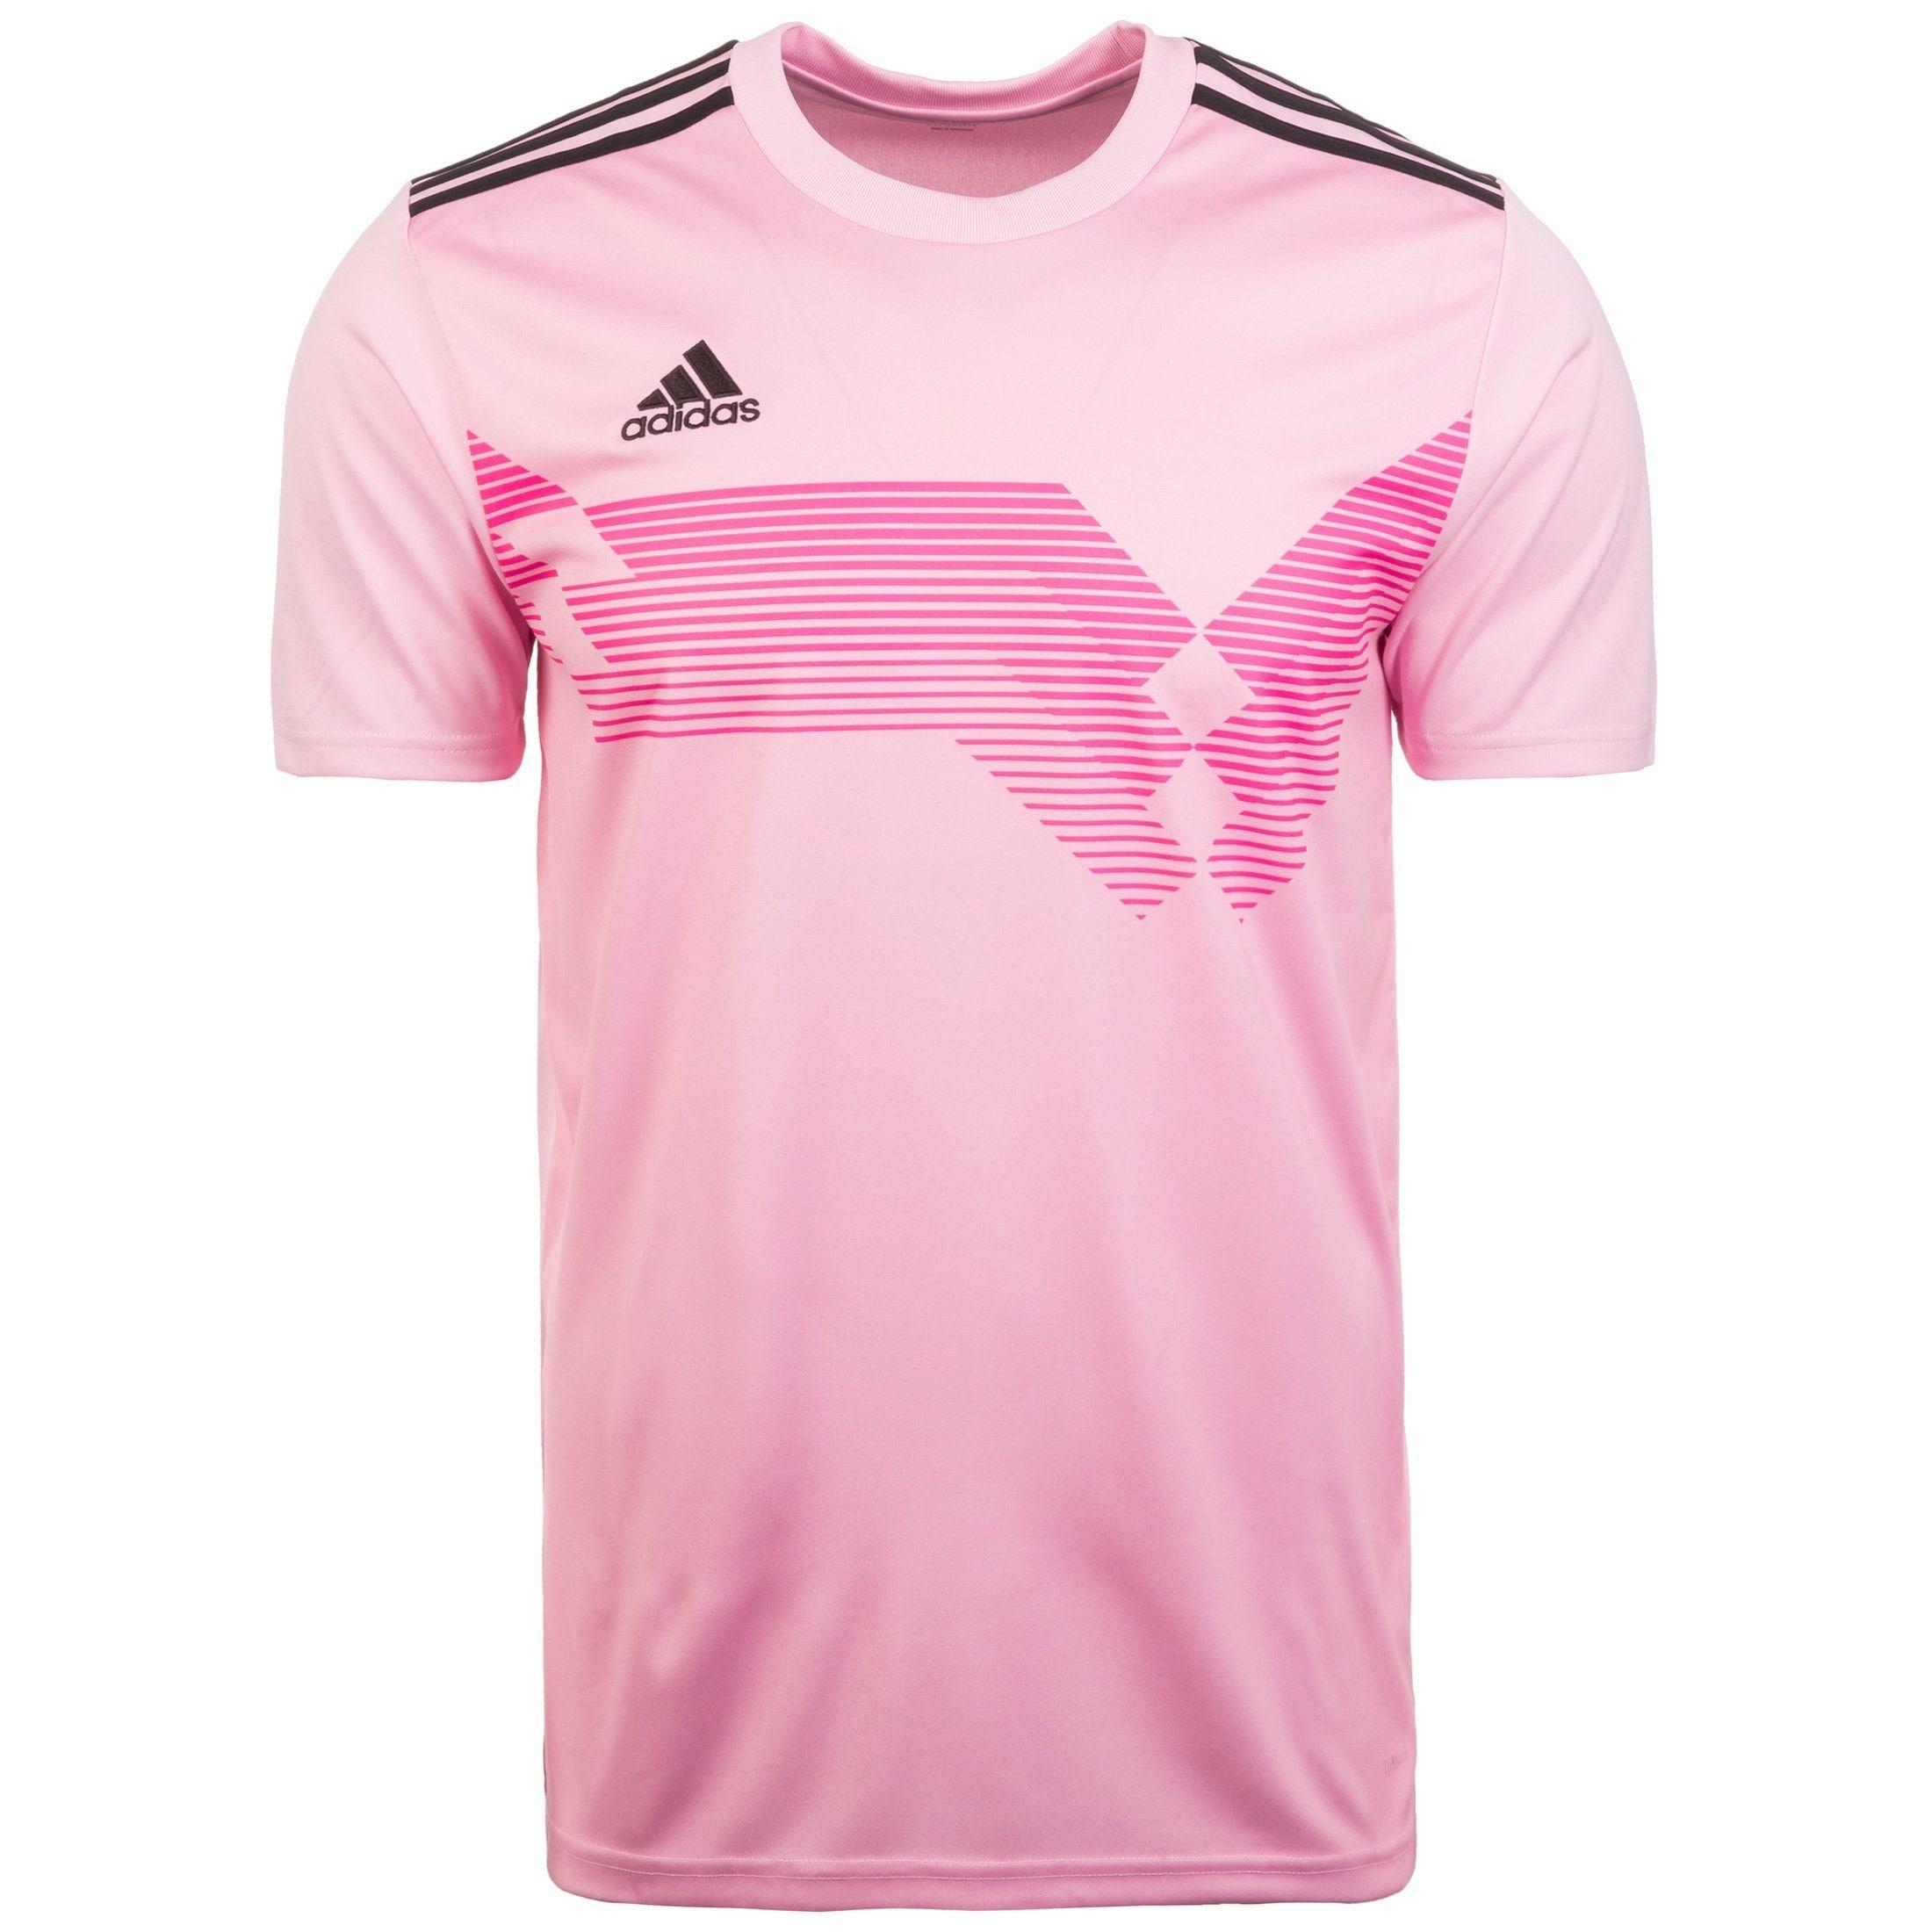 adidas Performance Fußballtrikot Campeon 19 Herren | Sportbekleidung > Trikots > Fußballtrikots | Rosa | Trikot - Jersey - Interlock | Adidas Performance